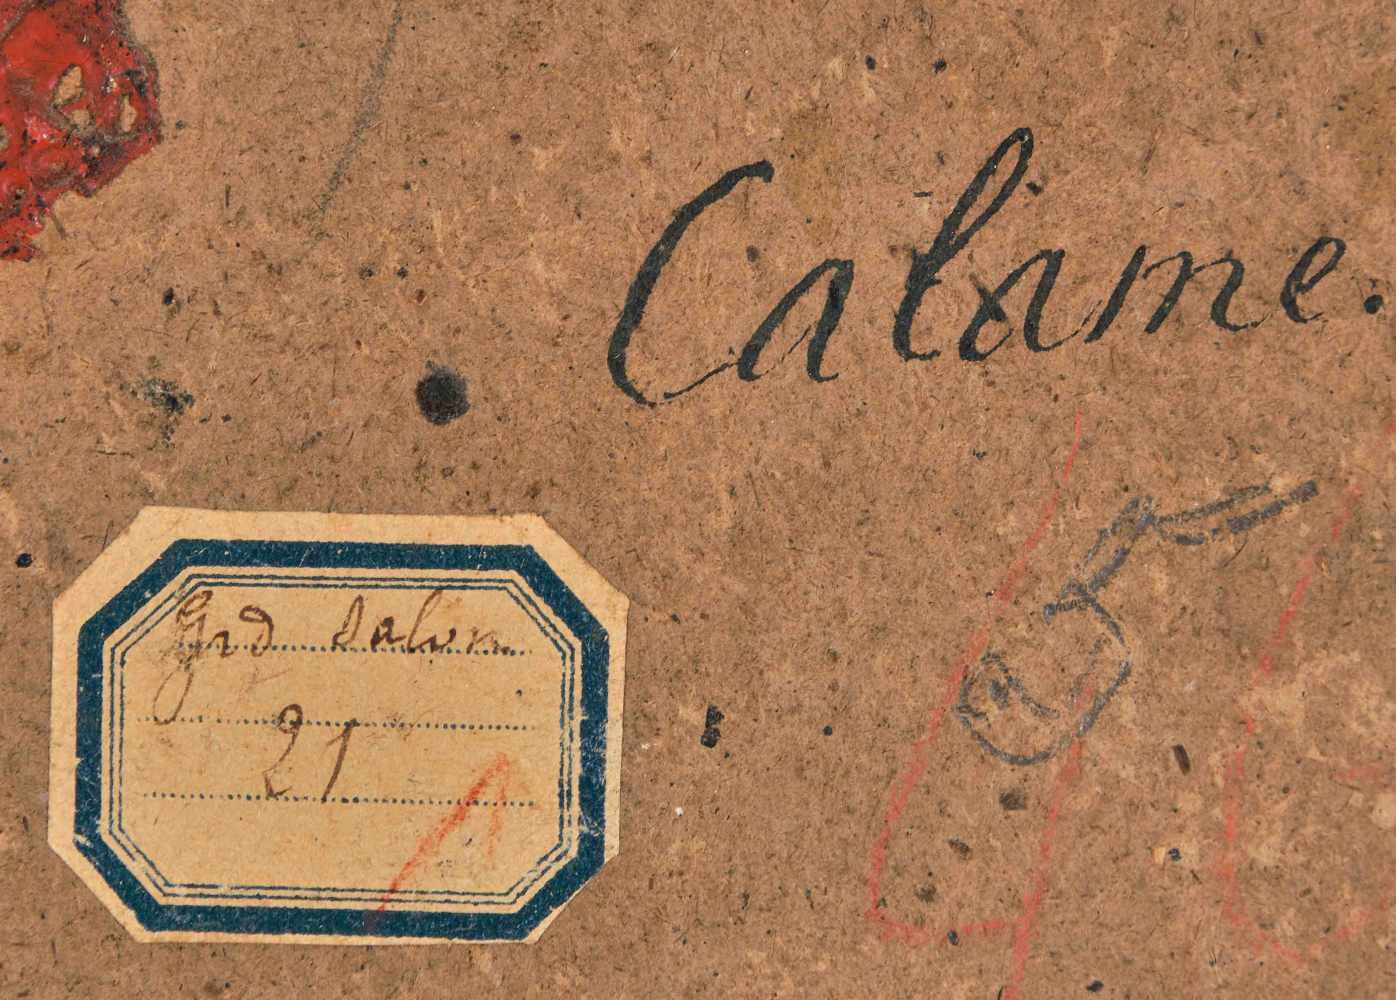 Lot 3005 - Calame, Alexandre